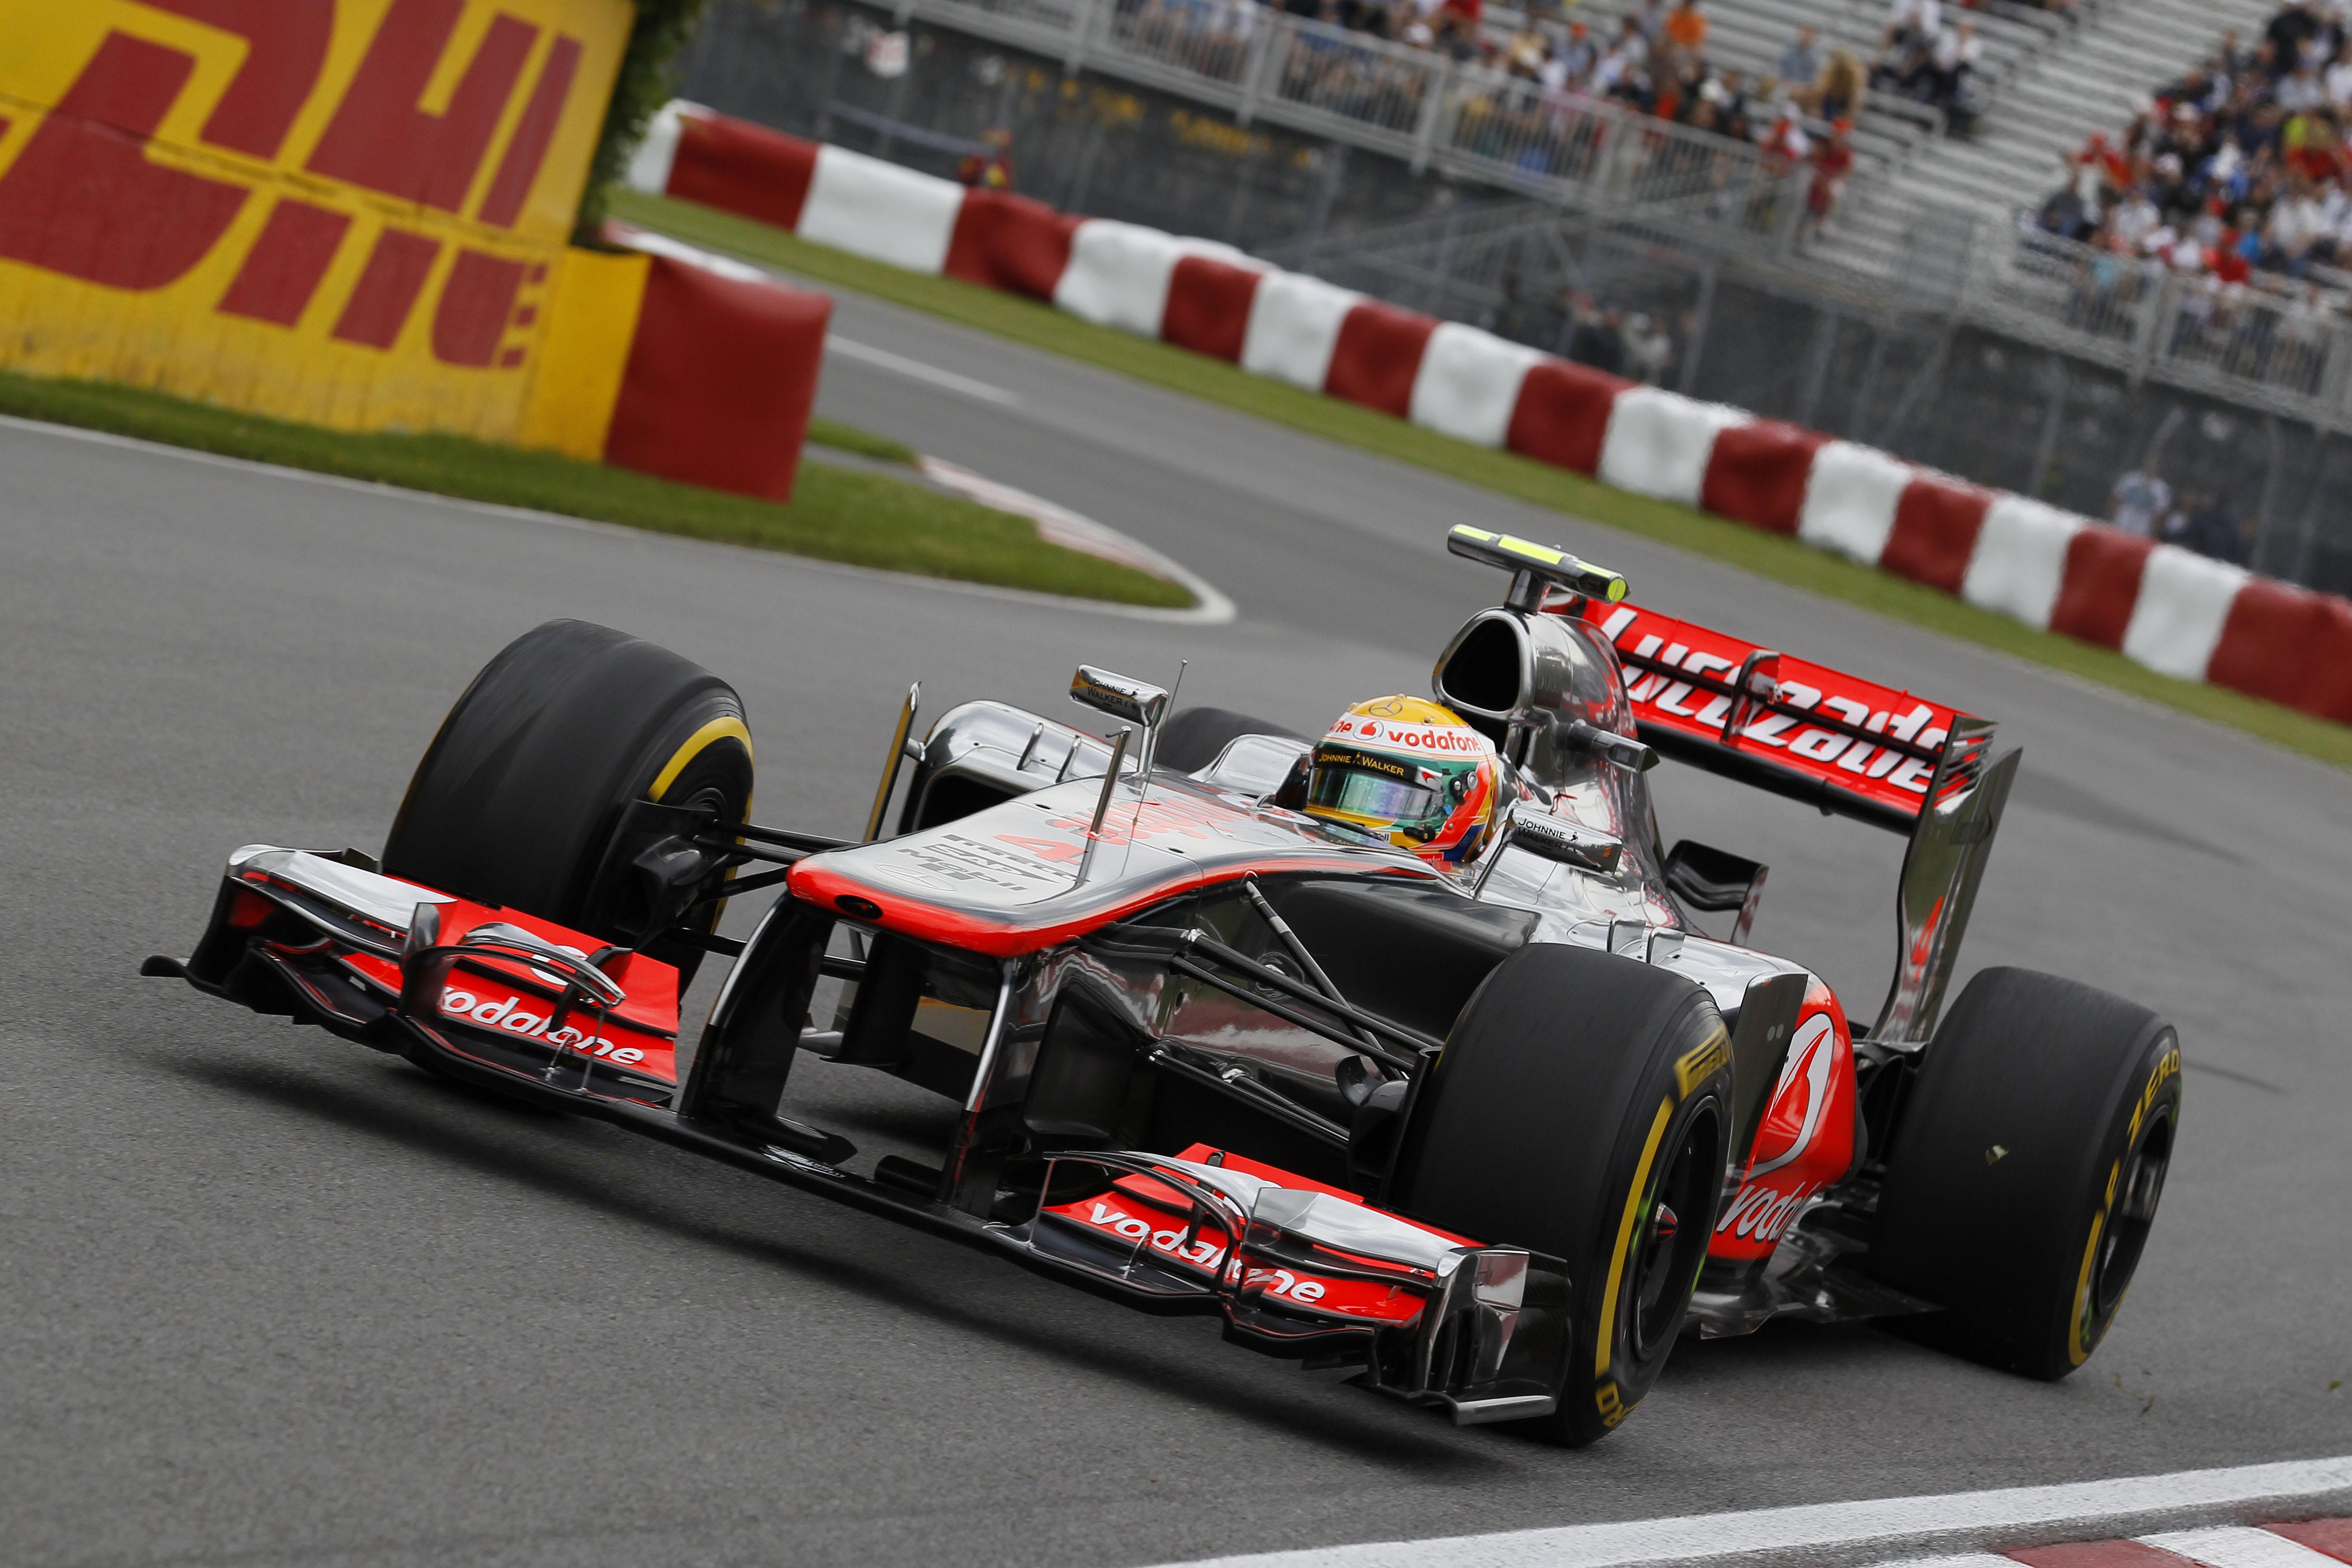 F1 2012 Canadian Grand Prix Practice Vodafone Mclaren